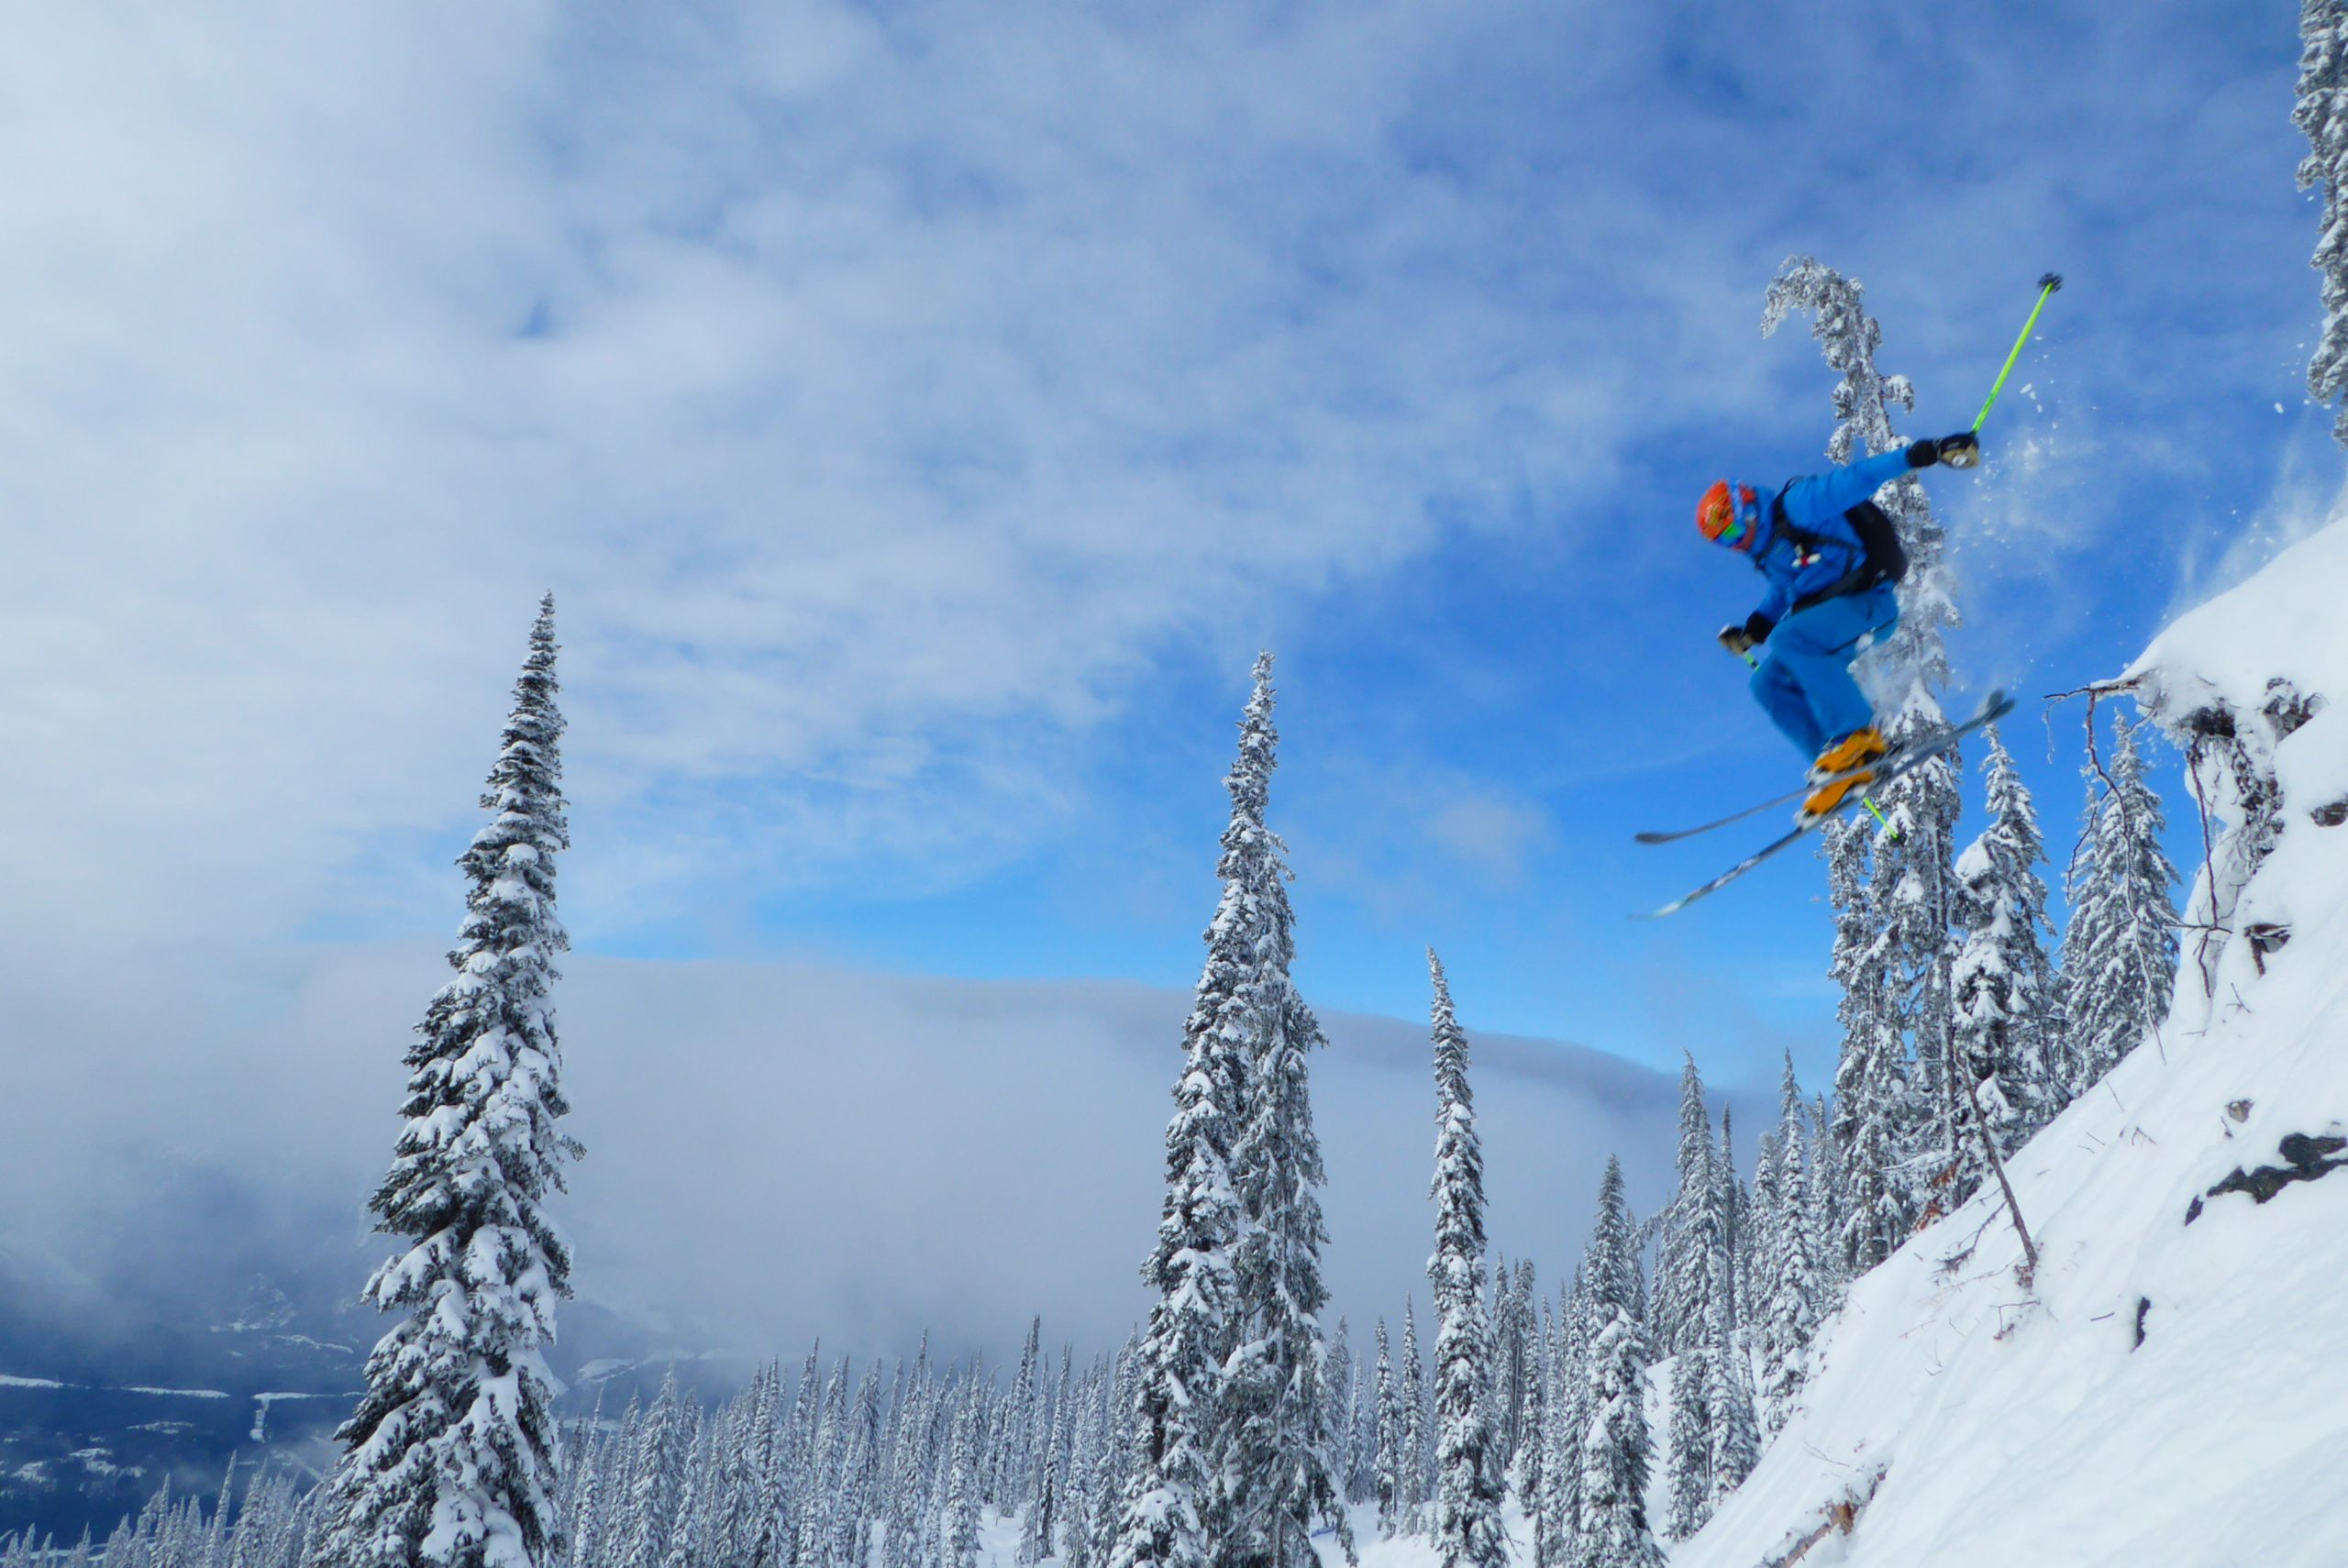 Curso esquí fuera de pista, semana en Alpes